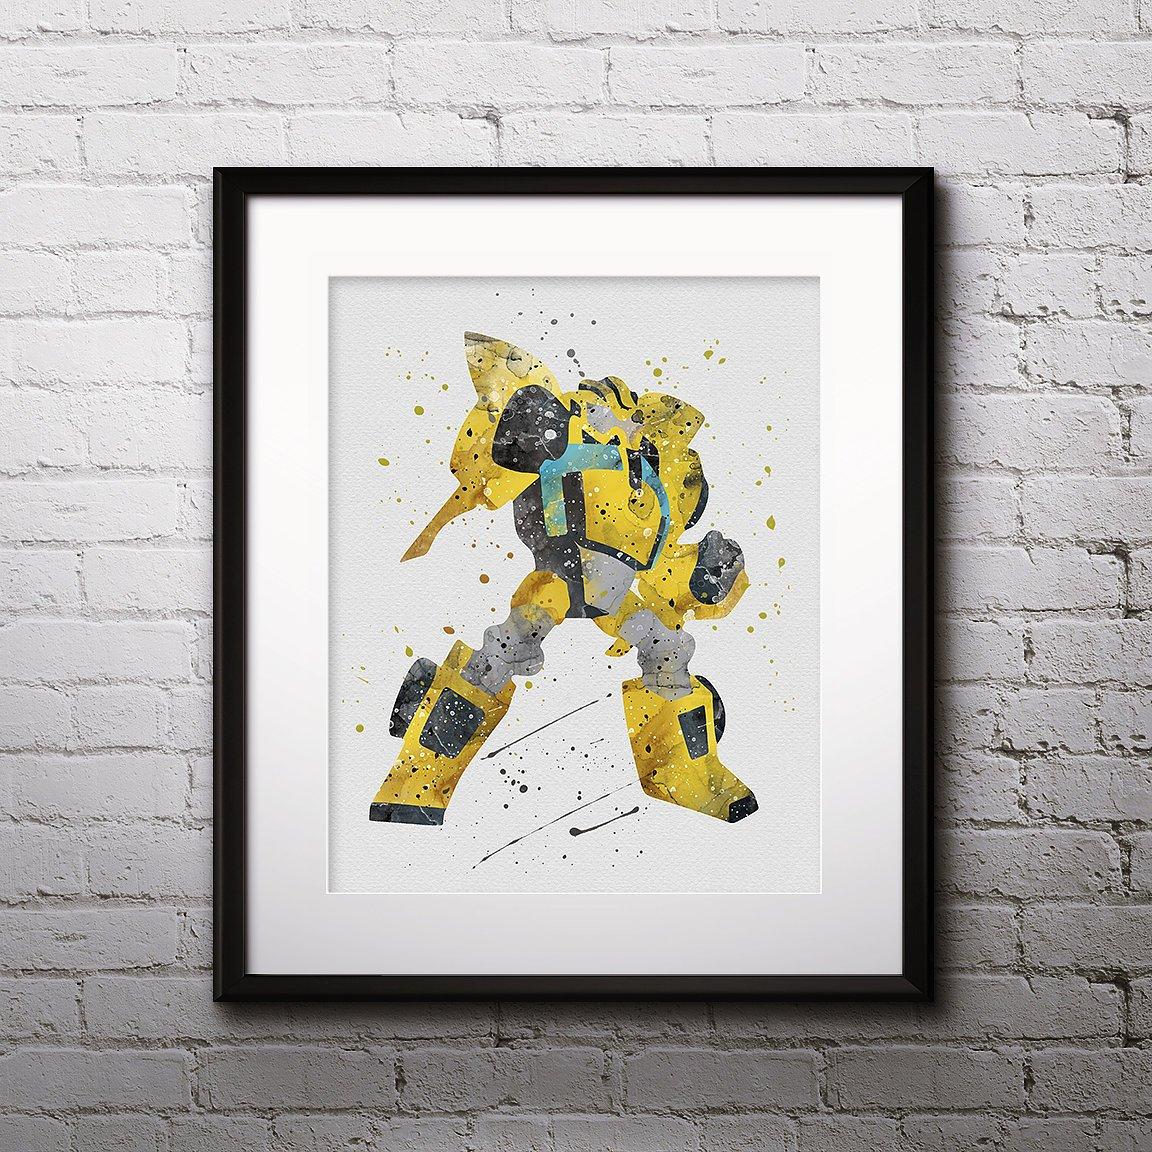 Bumblebee Watercolor Print Bumblebee Art Robot Art Transformers Painting Anime Art Nursery Kids Room Decor Wall Art